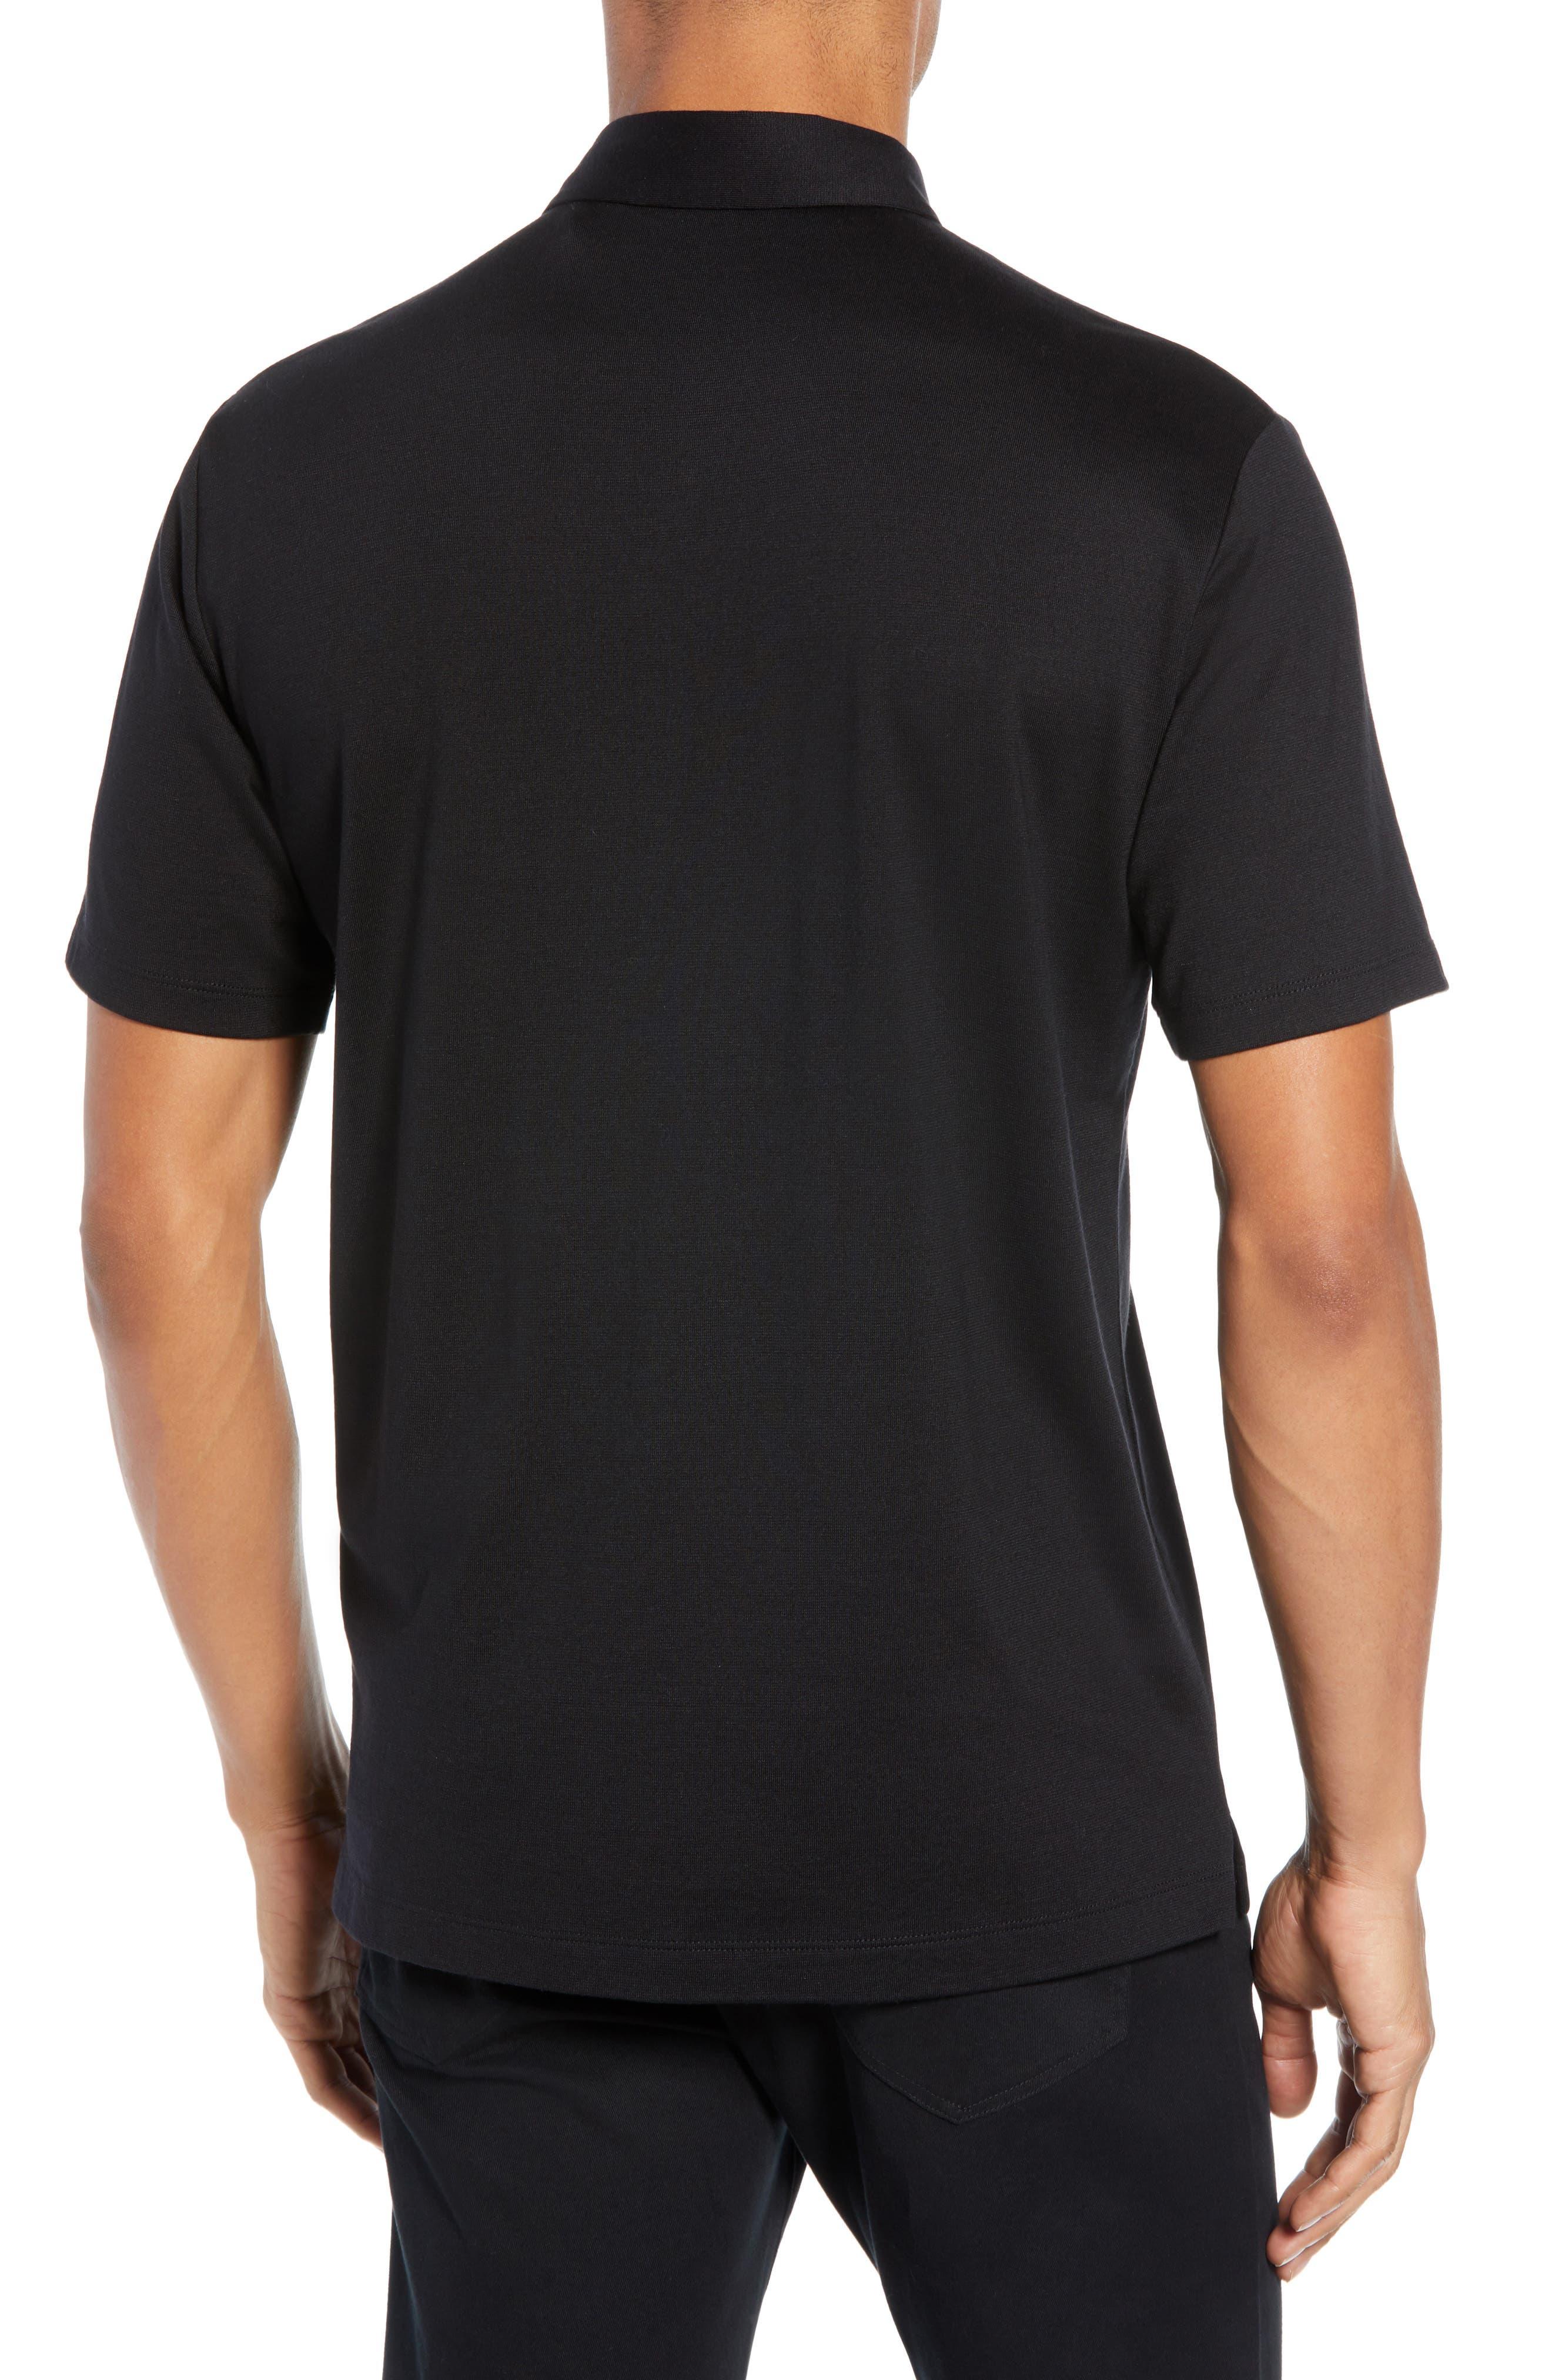 Incisi Slim Fit Knit Silk Blend Shirt,                             Alternate thumbnail 2, color,                             BLACK